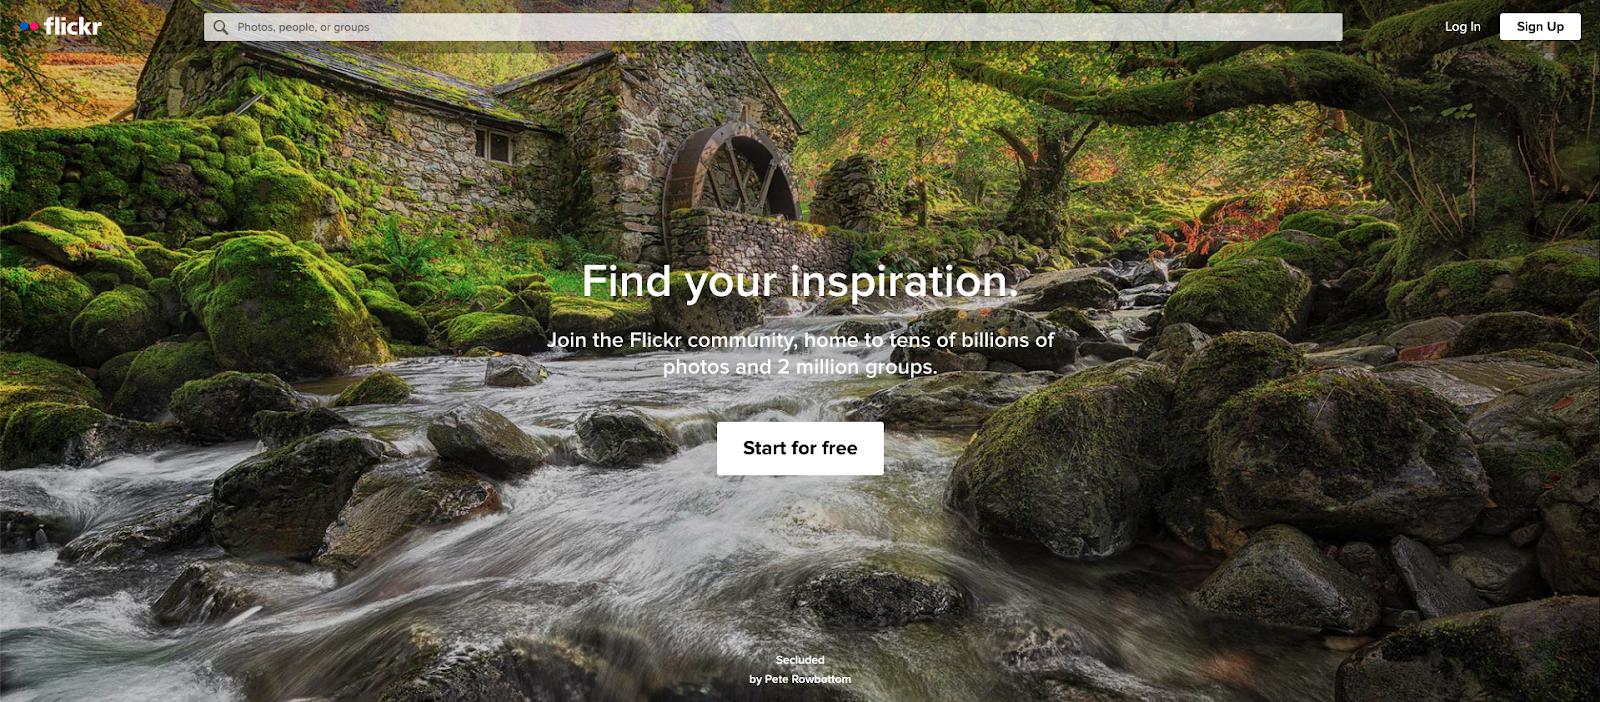 Flickr home page screengrab